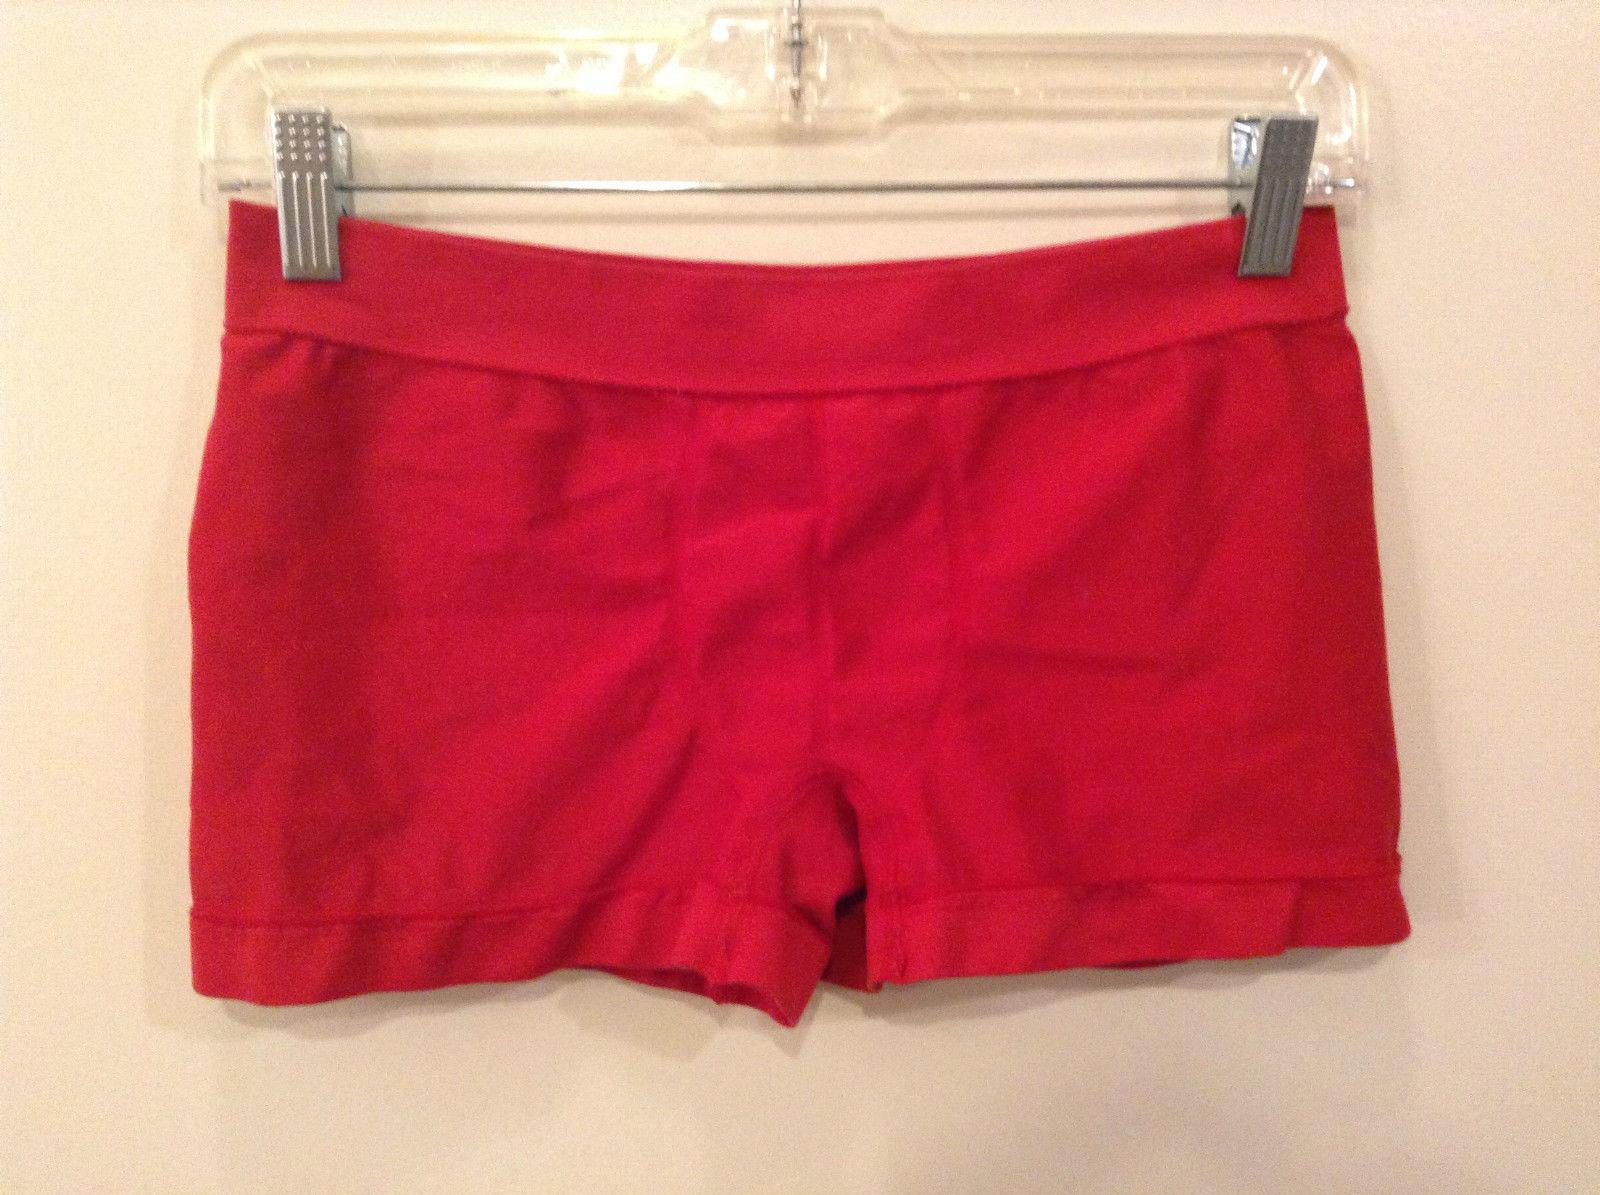 Calvin Klein Red Underwear Elastic Fabric 100 Percent Nylon